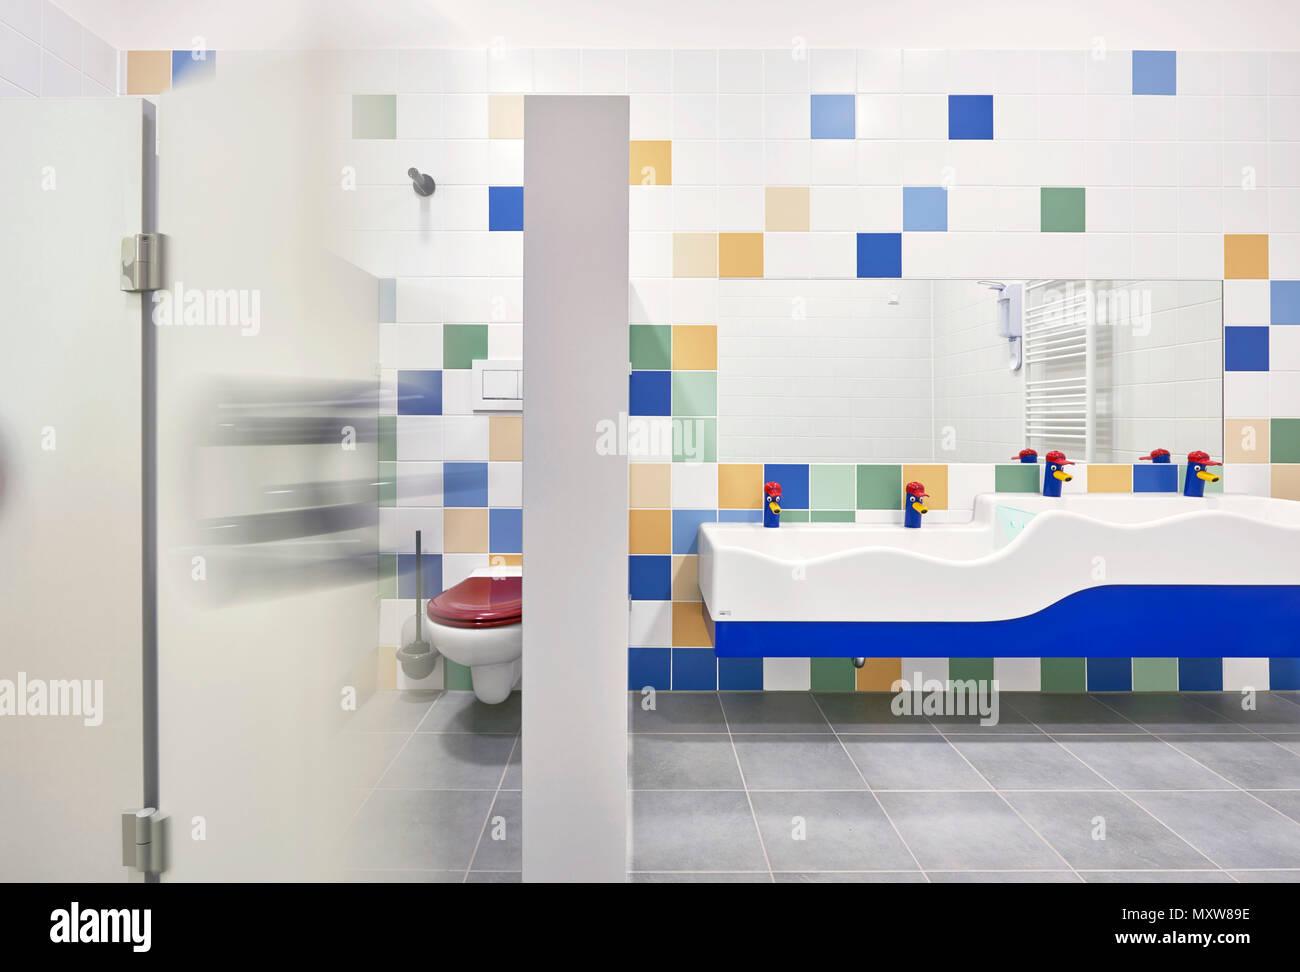 Badezimmer Kindergarten Stockfotografie - Alamy